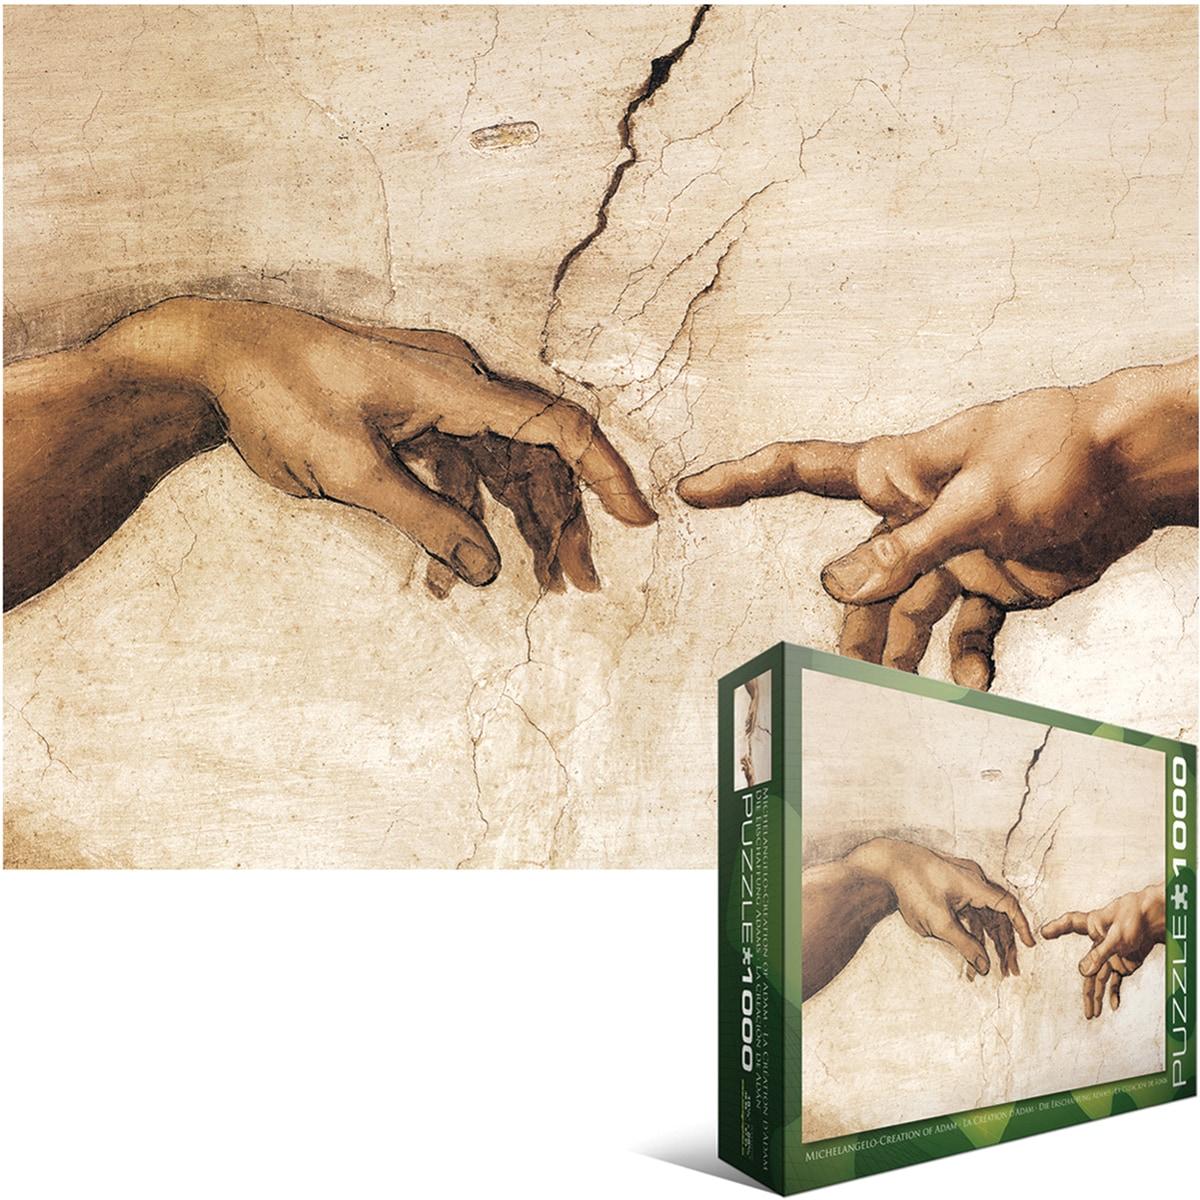 Jigsaw Puzzle 1000 Pieces -Michelangelo - Creation-det